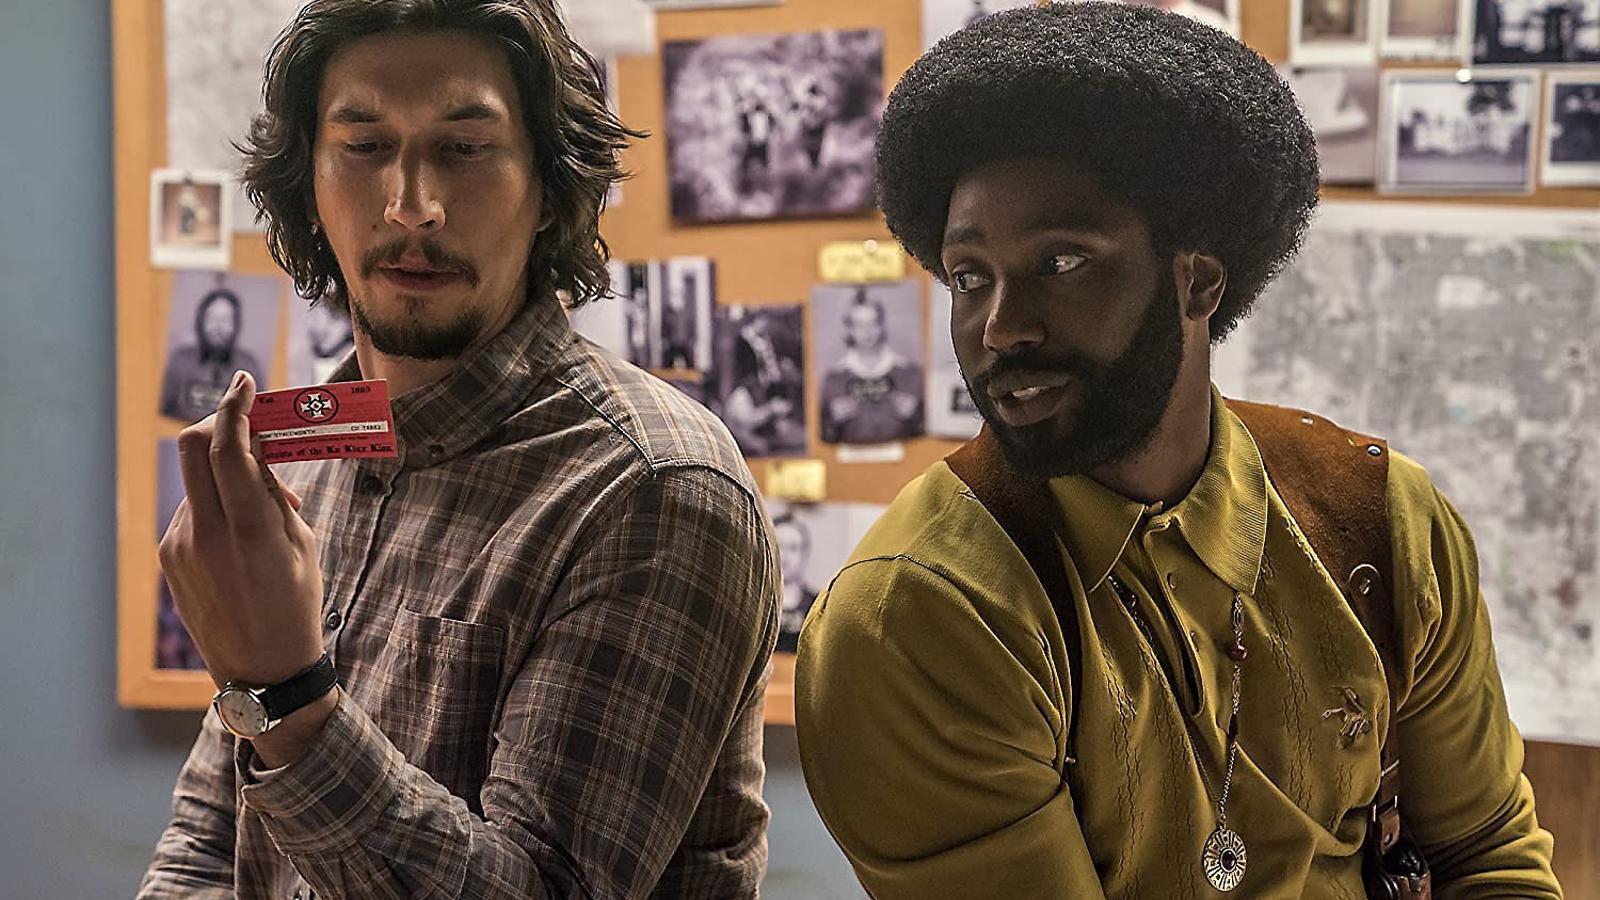 Fotograma de la pel·lícula Infiltrado en el KKKlan, dirigida per Spike Lee.